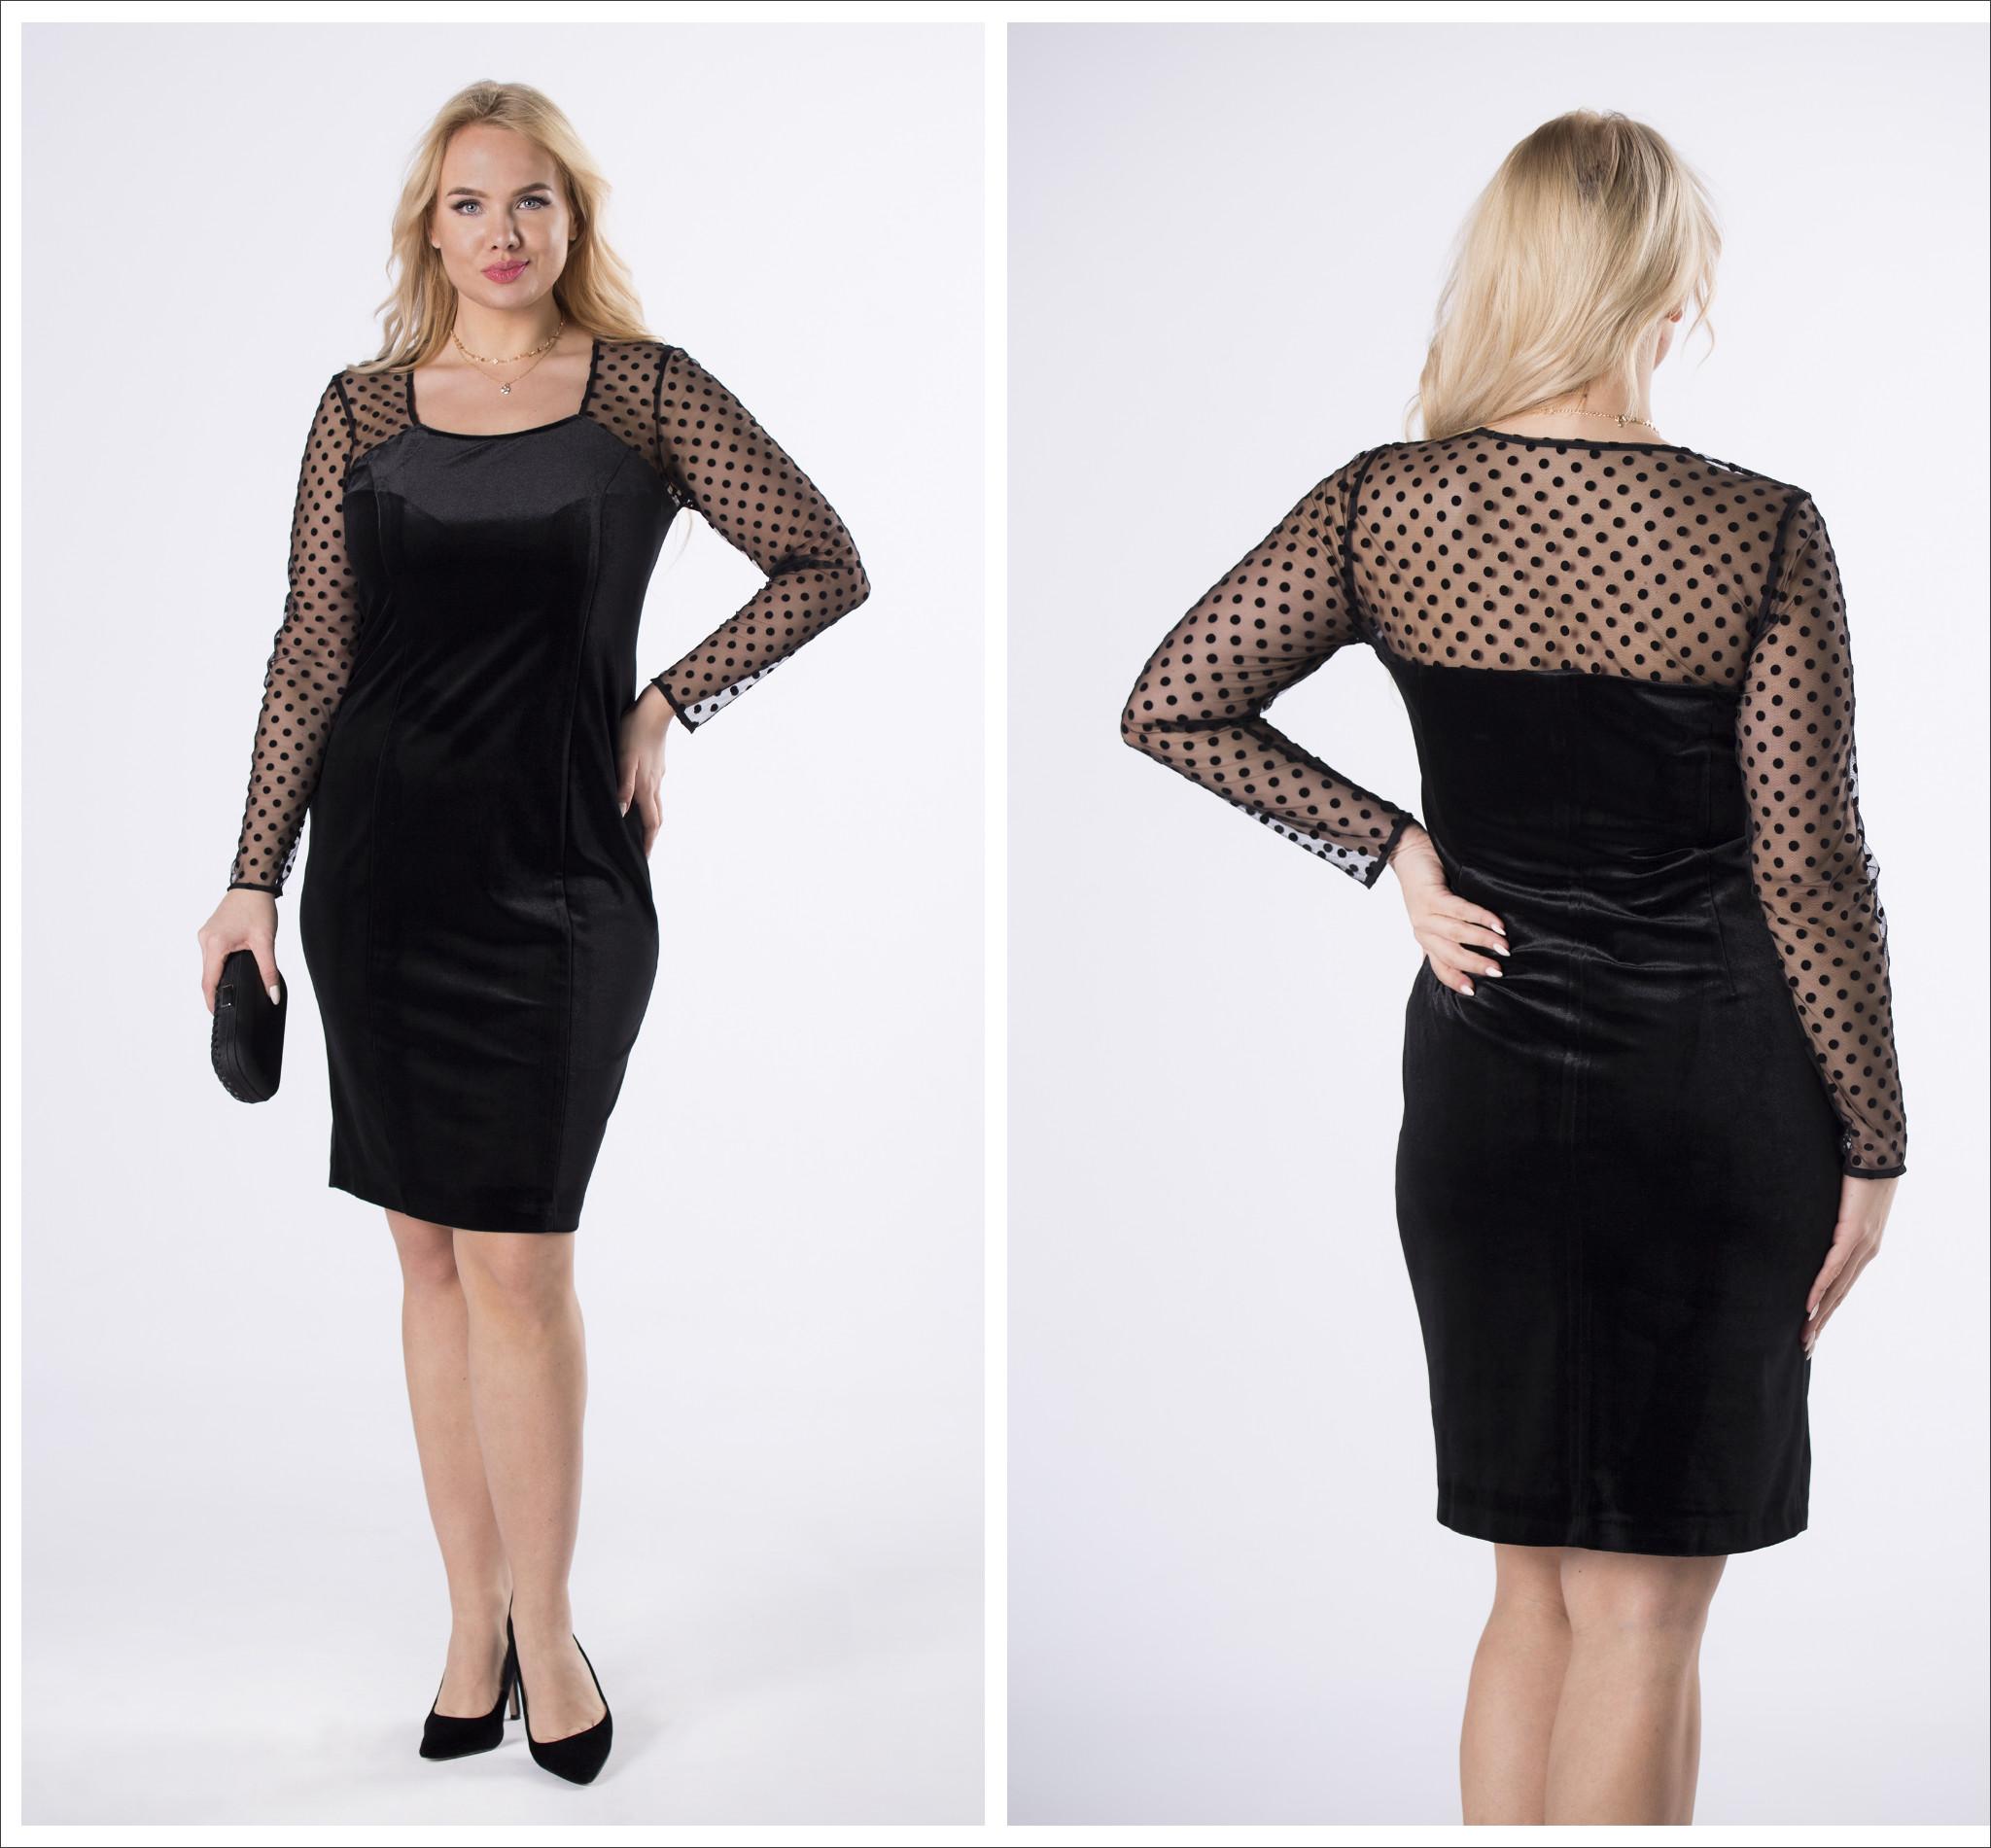 rochie catifea neagra cu maneci lungi din tulle cu buline